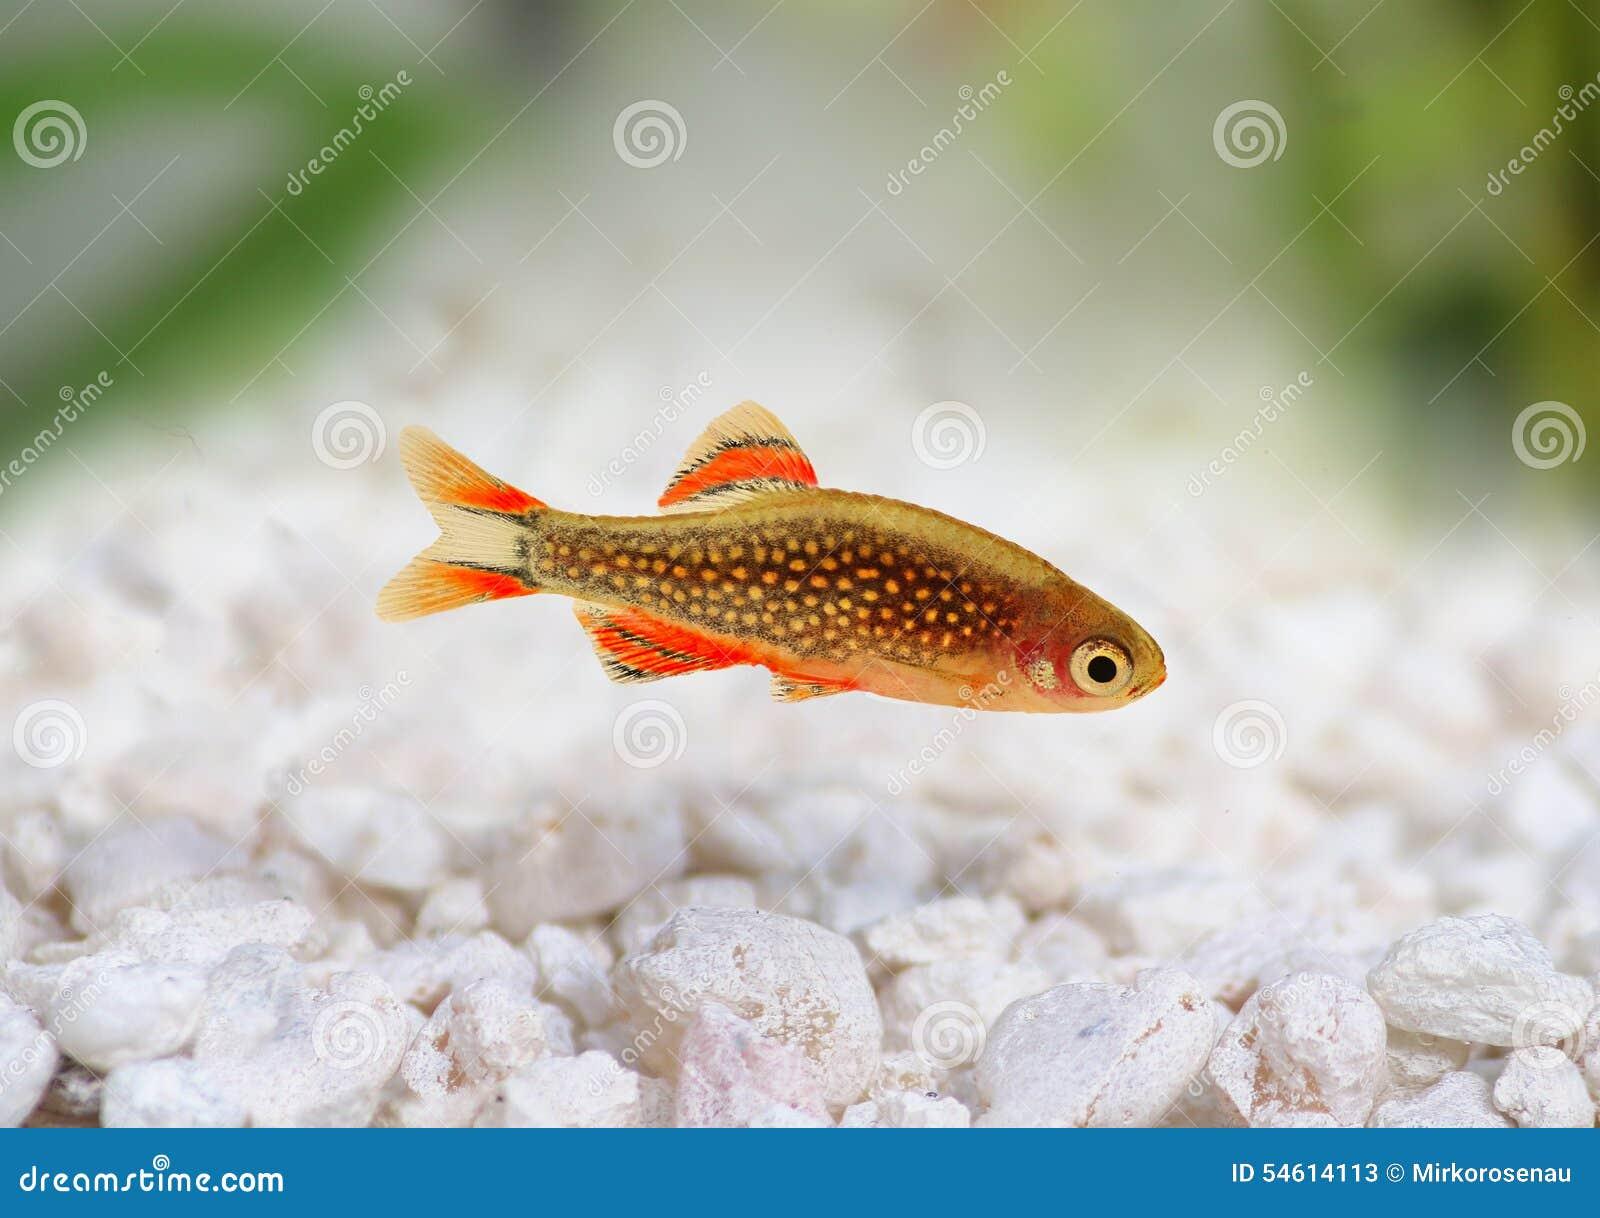 Freshwater aquarium fish rasbora - Galaxy Rasbora Danio Margaritatus Pearl Danio Aquarium Fish